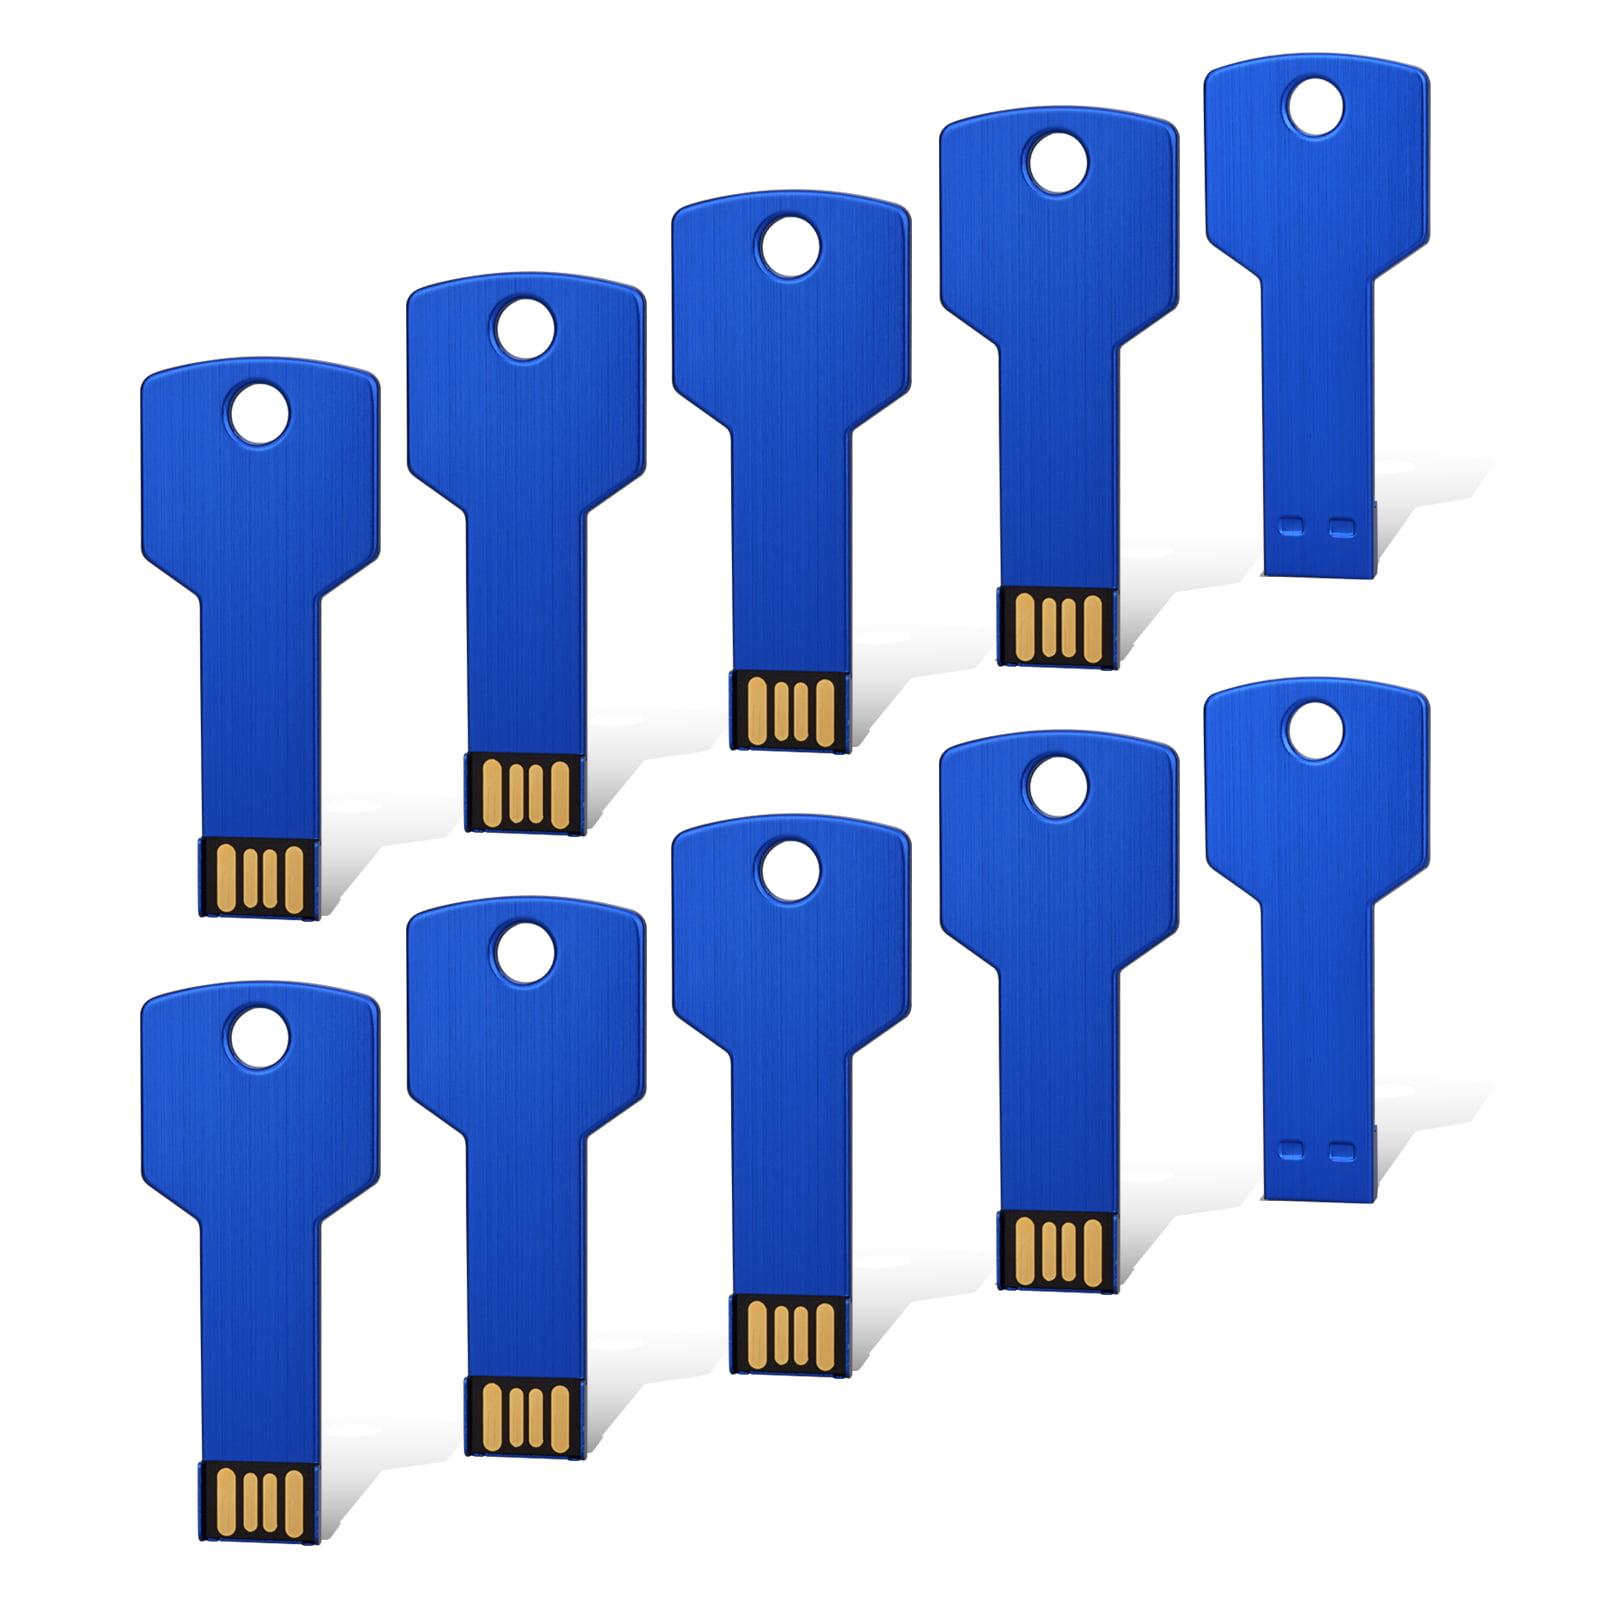 KOOTION 10Pack 1GB Metal Key Design USB Flash Drive, Metal Key Shaped Memory Stick, USB 2.0 Blue